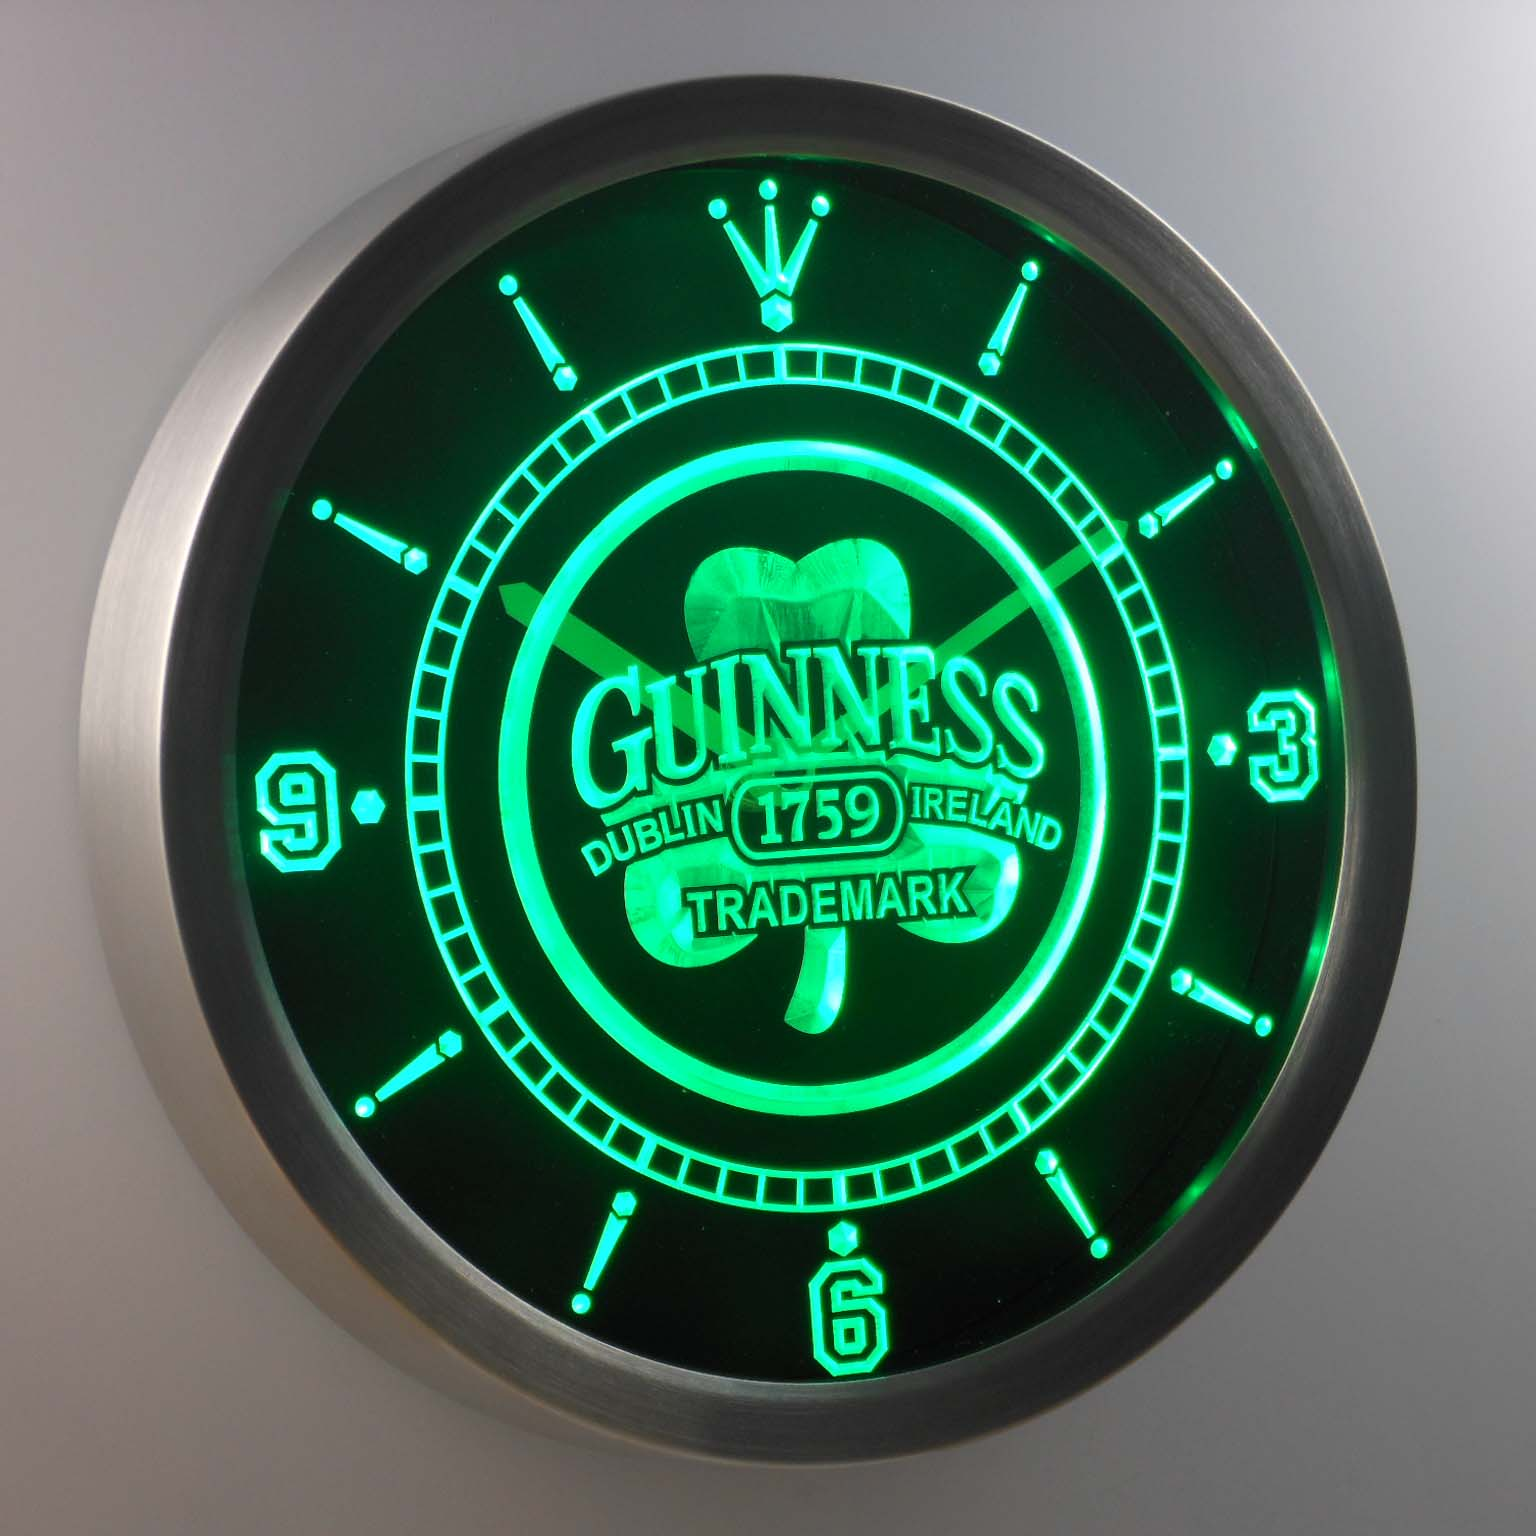 Nc0108 Guinness 1759 Shamrock Bar Bier Neon Licht Zeichen LED Wanduhr